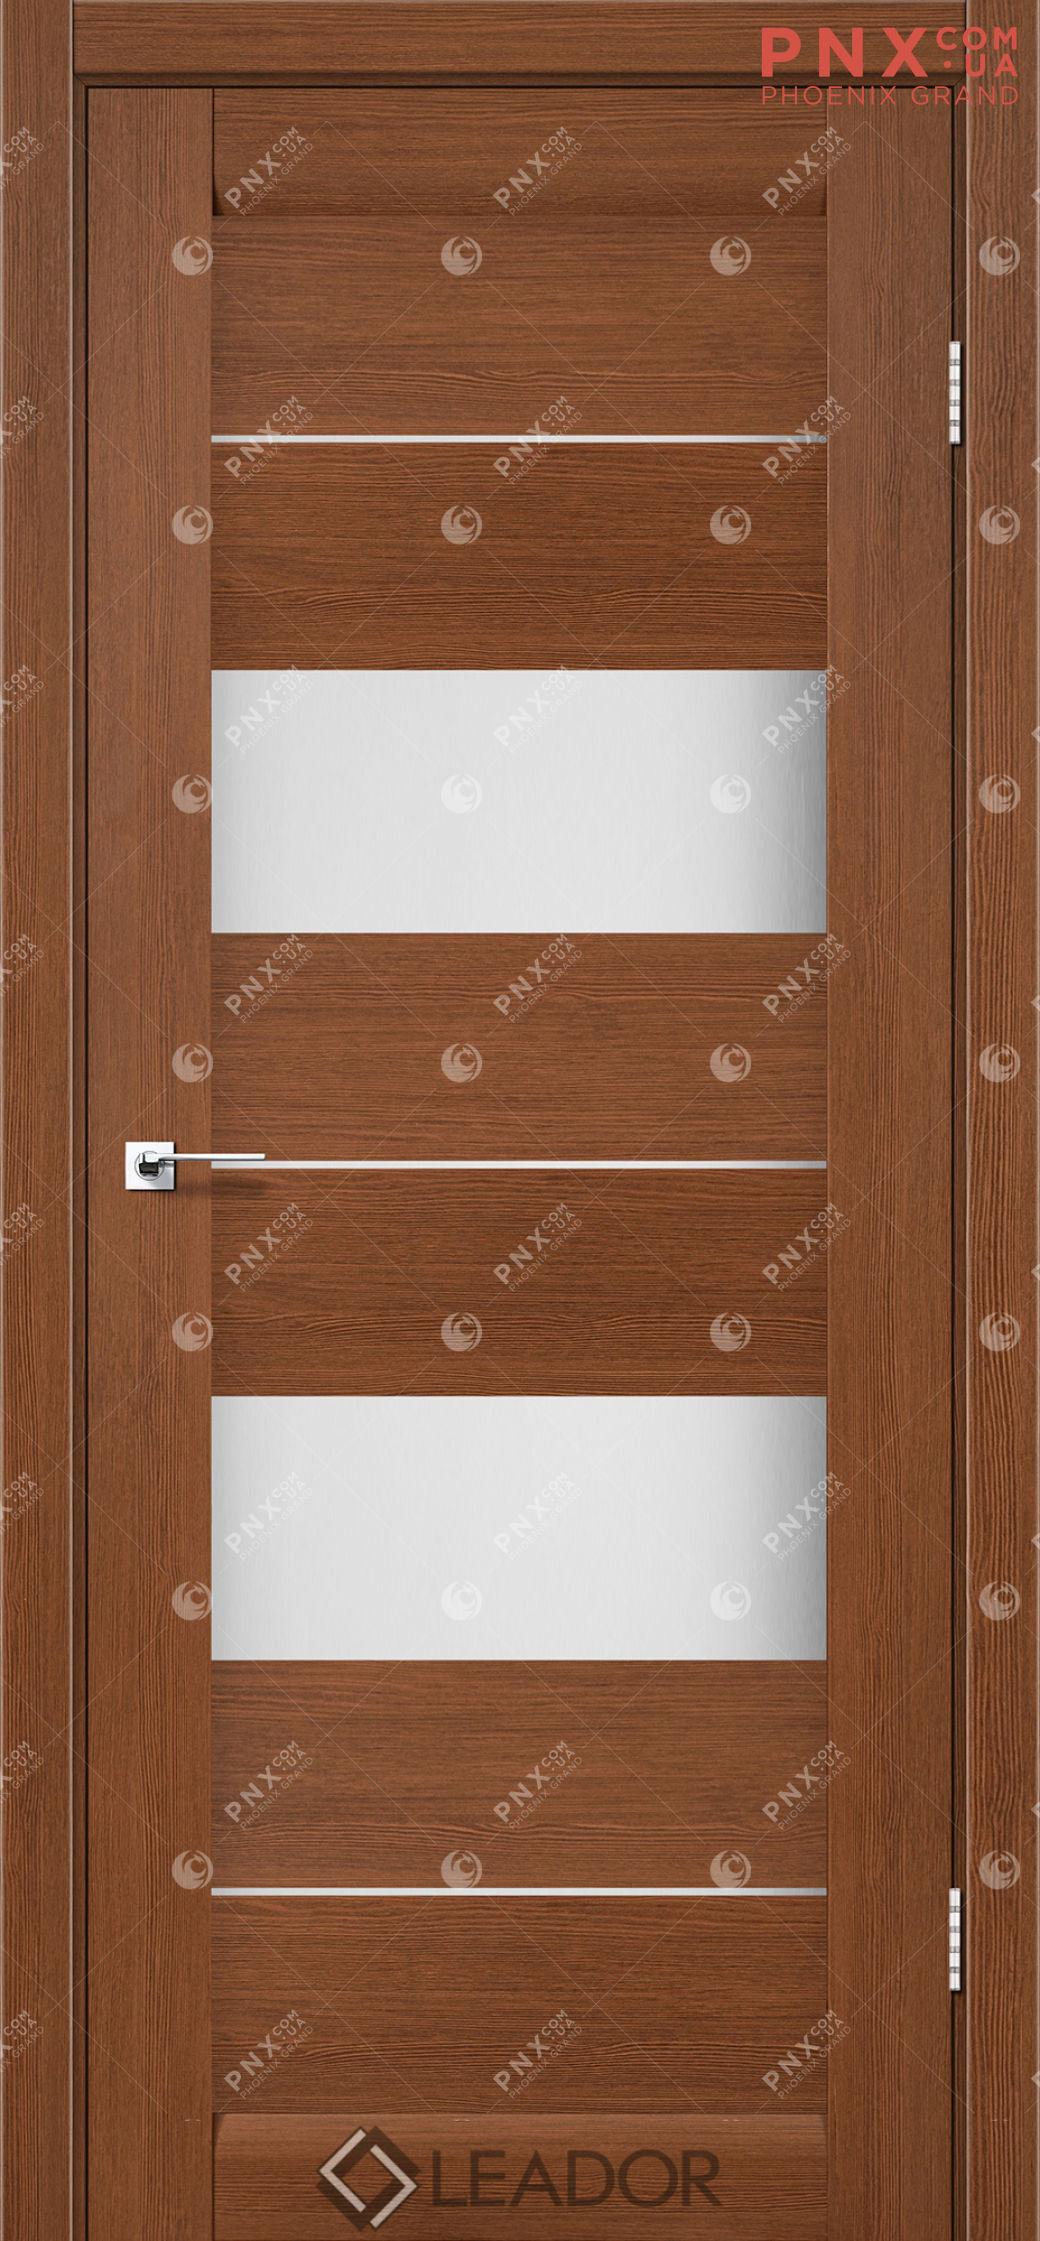 Межкомнатная дверь LEADOR Canneli, Браун, Белое стекло сатин